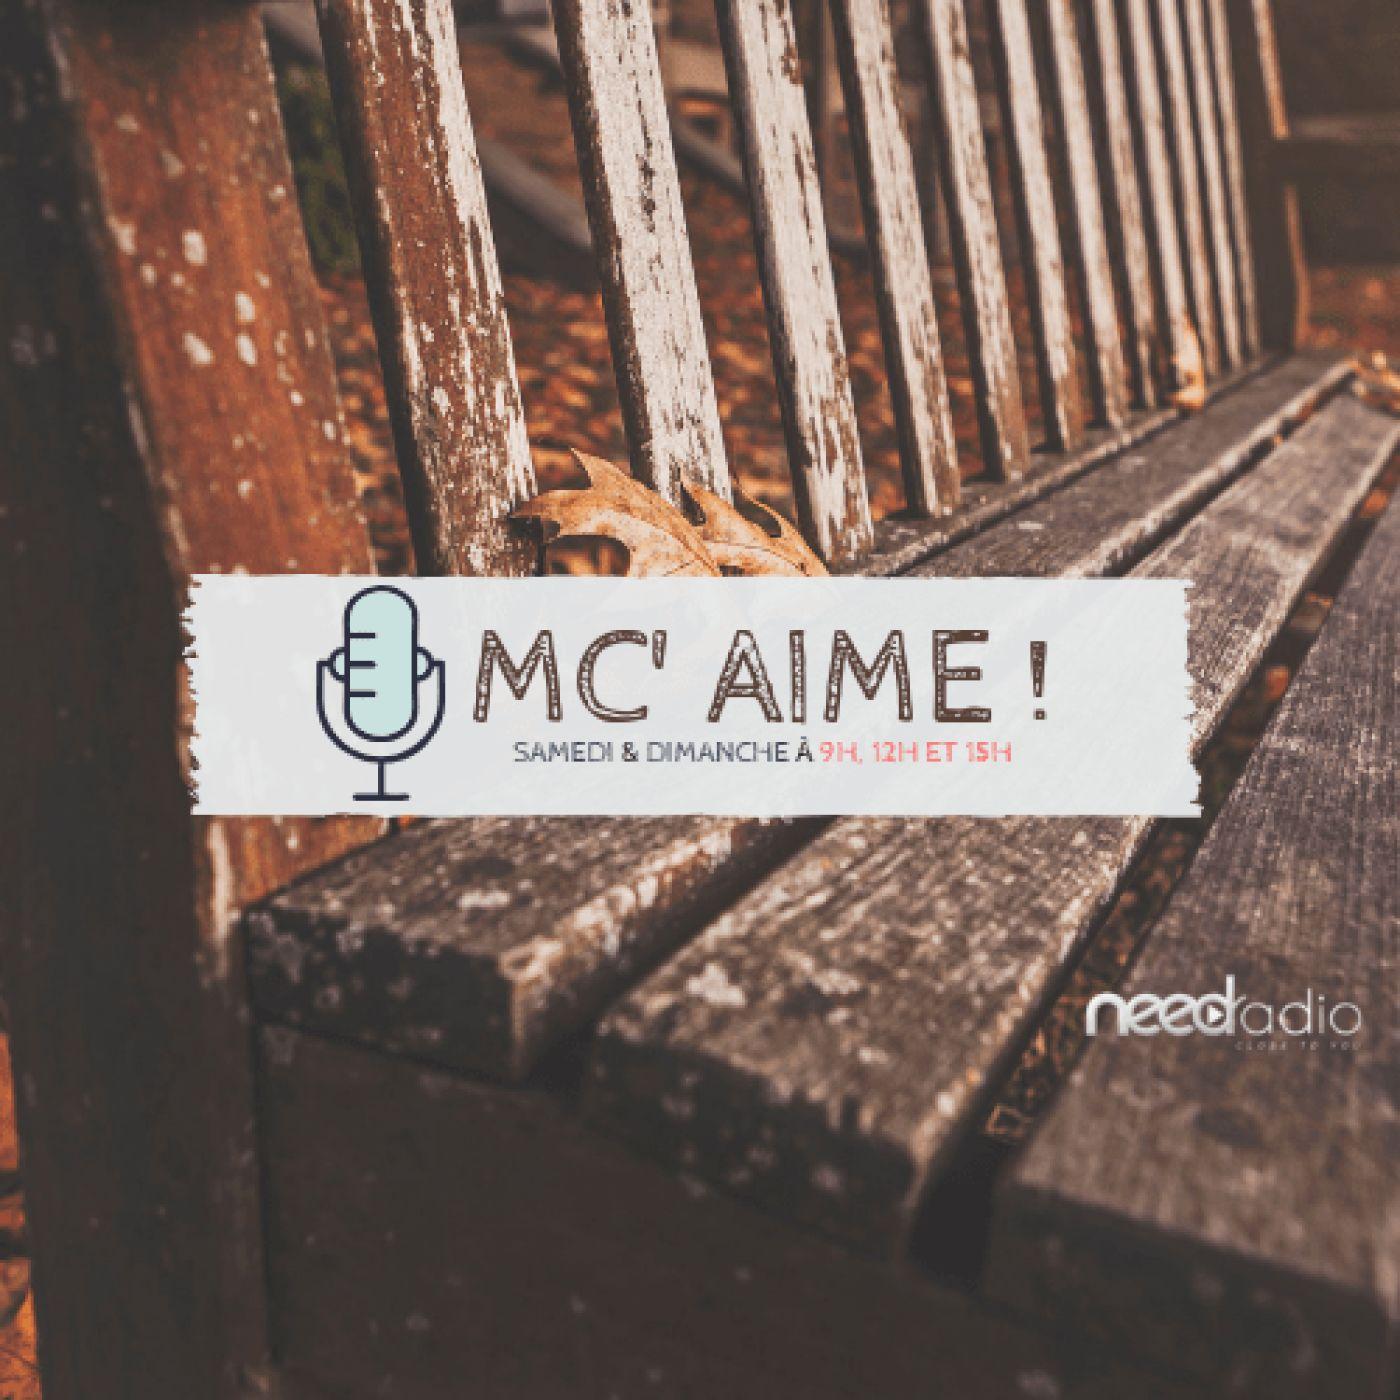 MC' Aime - L'arboretum de Châtenay-Malabry (05/05/19)